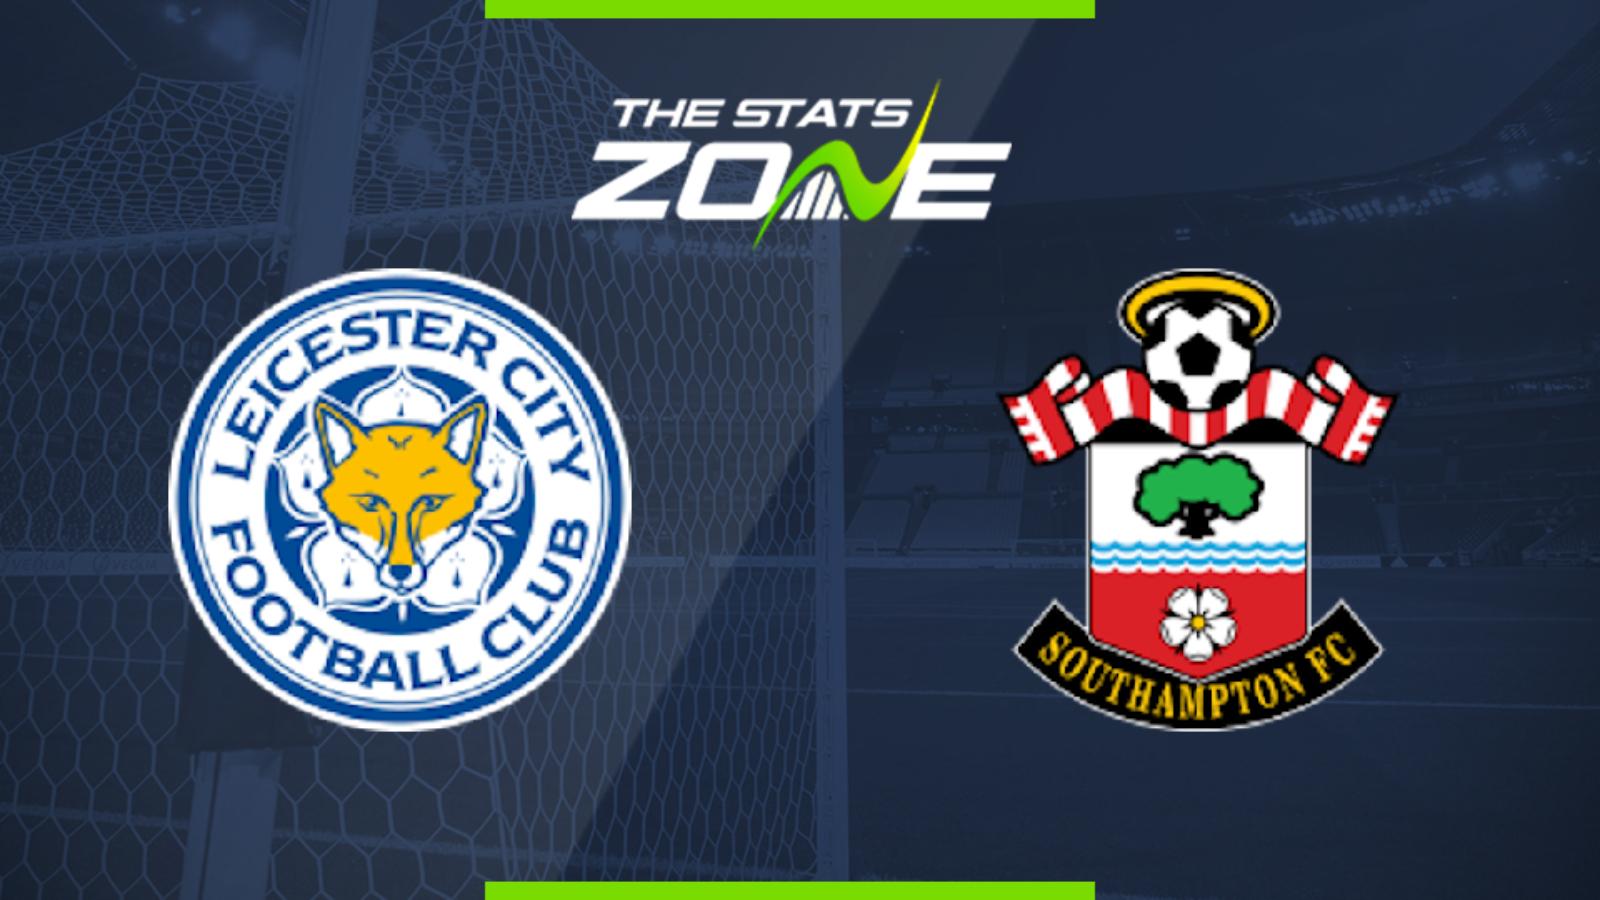 2019 20 Premier League Leicester Vs Southampton Preview Prediction The Stats Zone